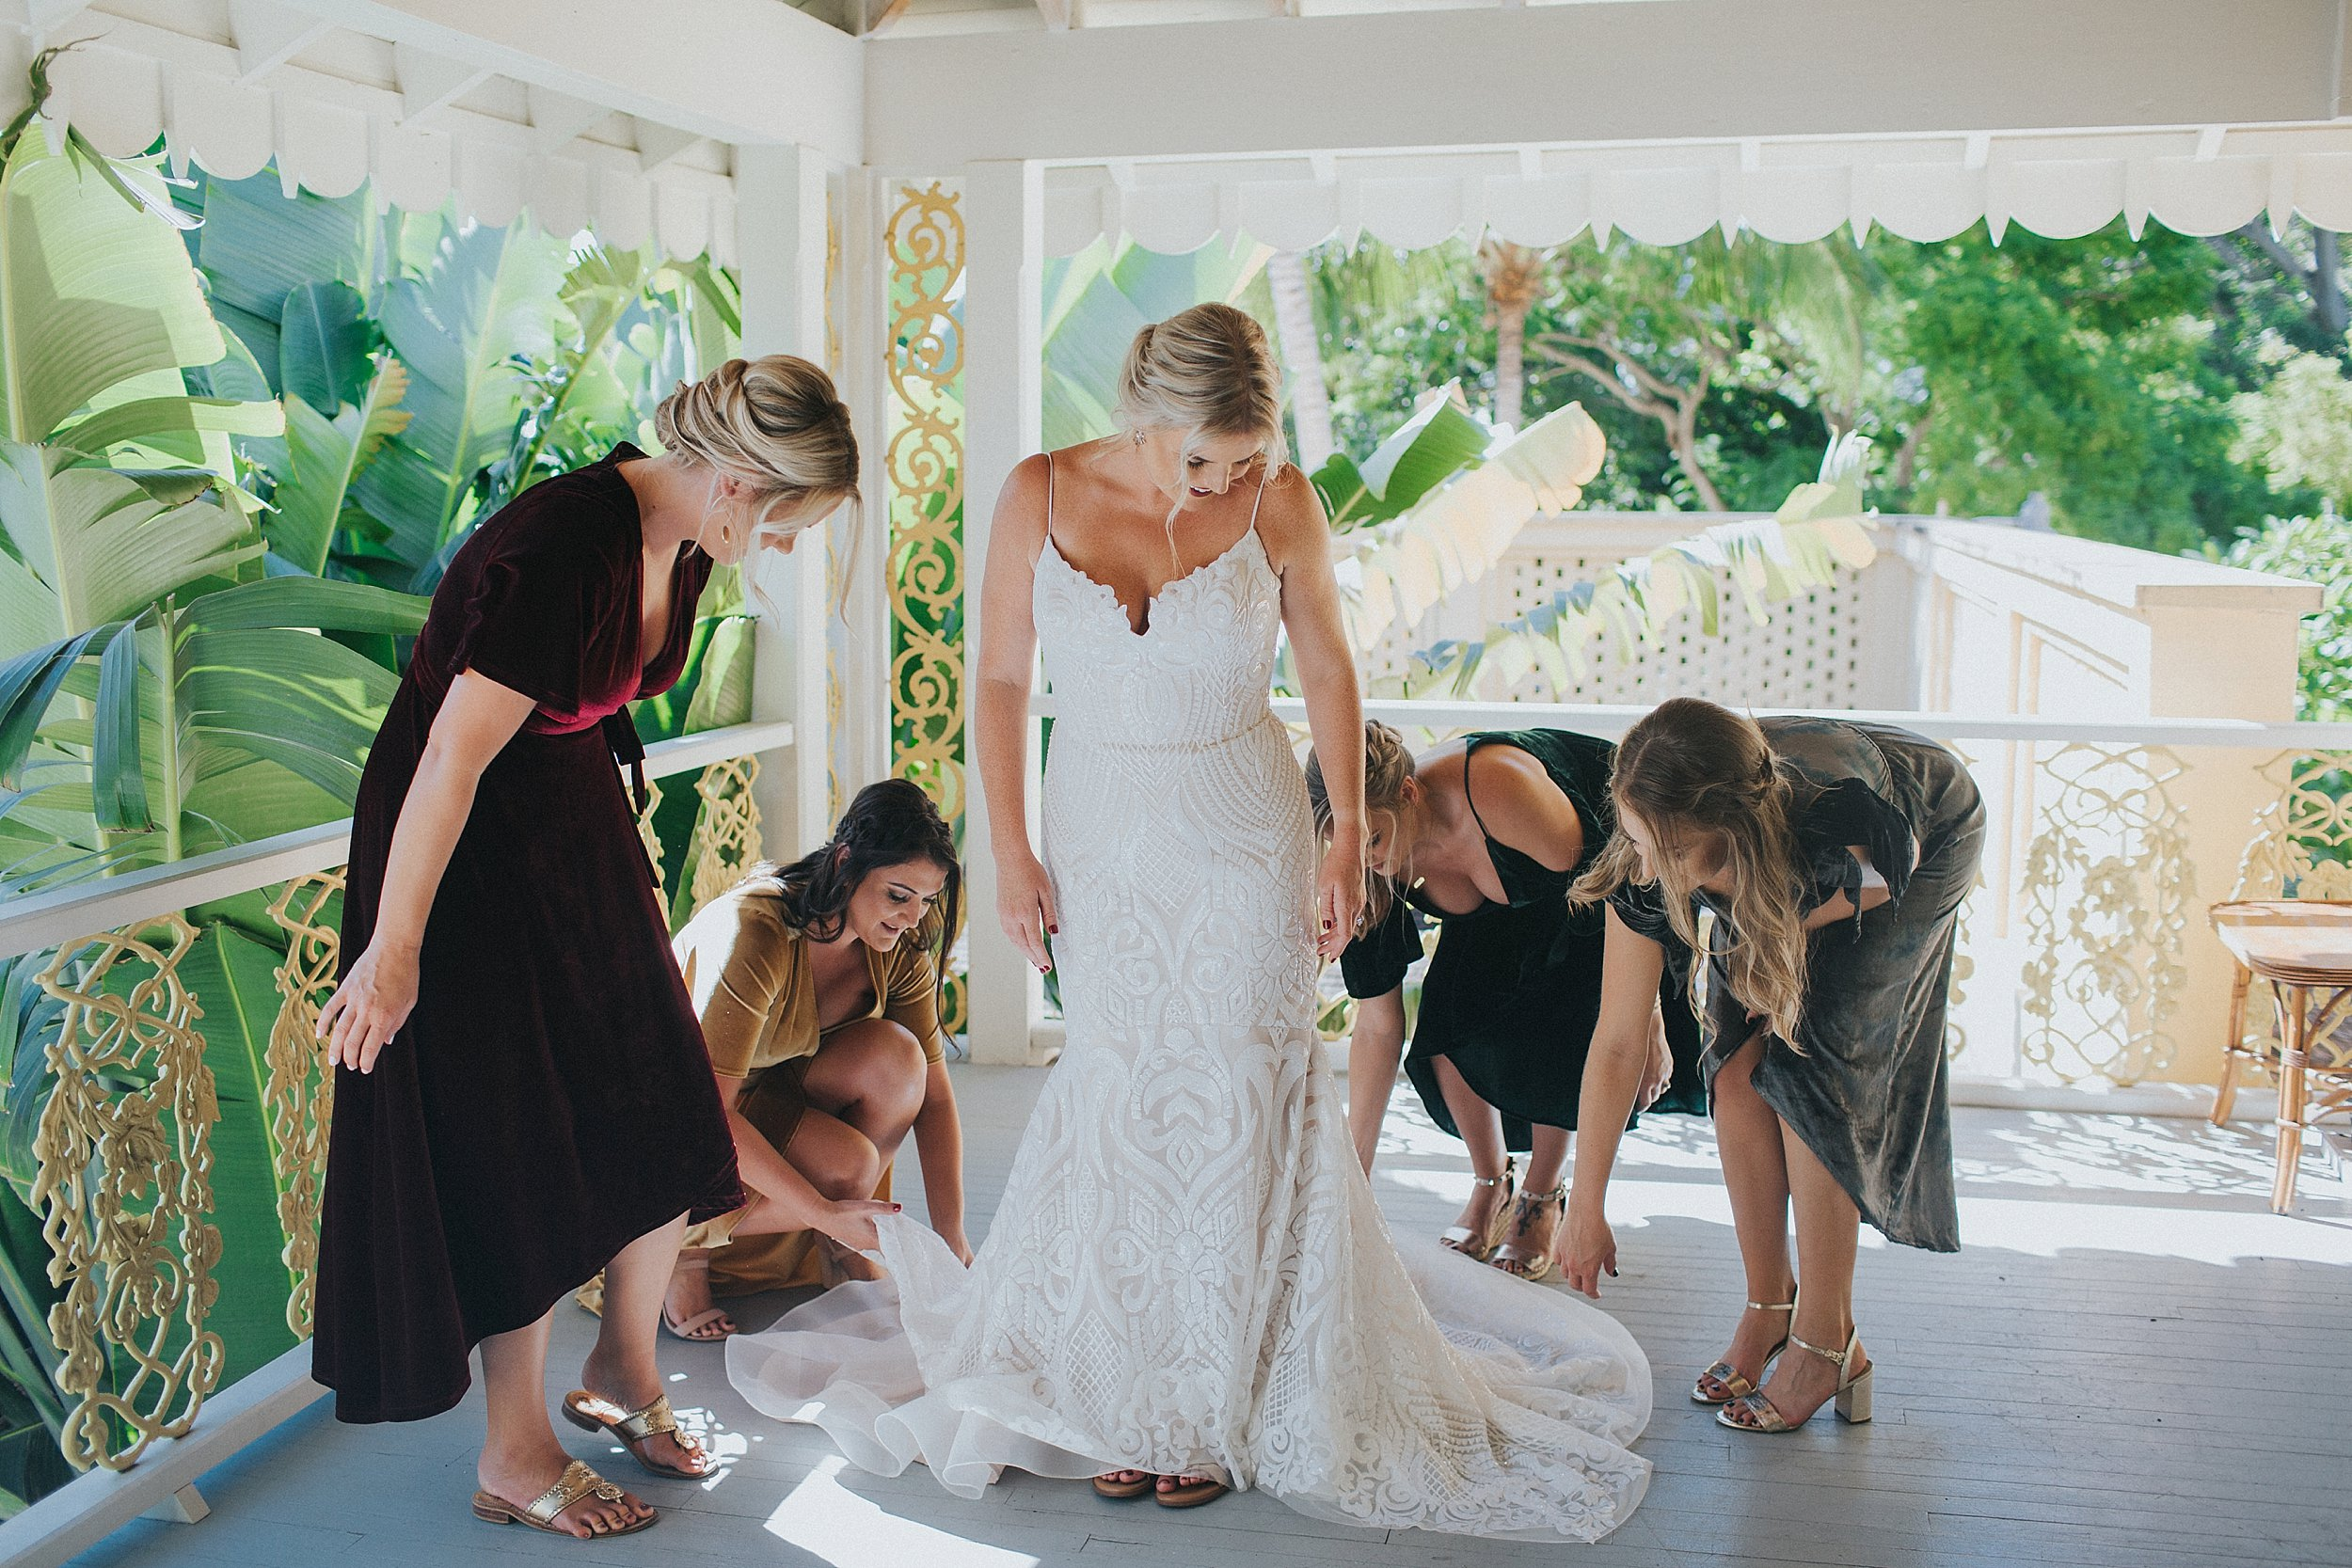 jewel tone bridesmaids dresses